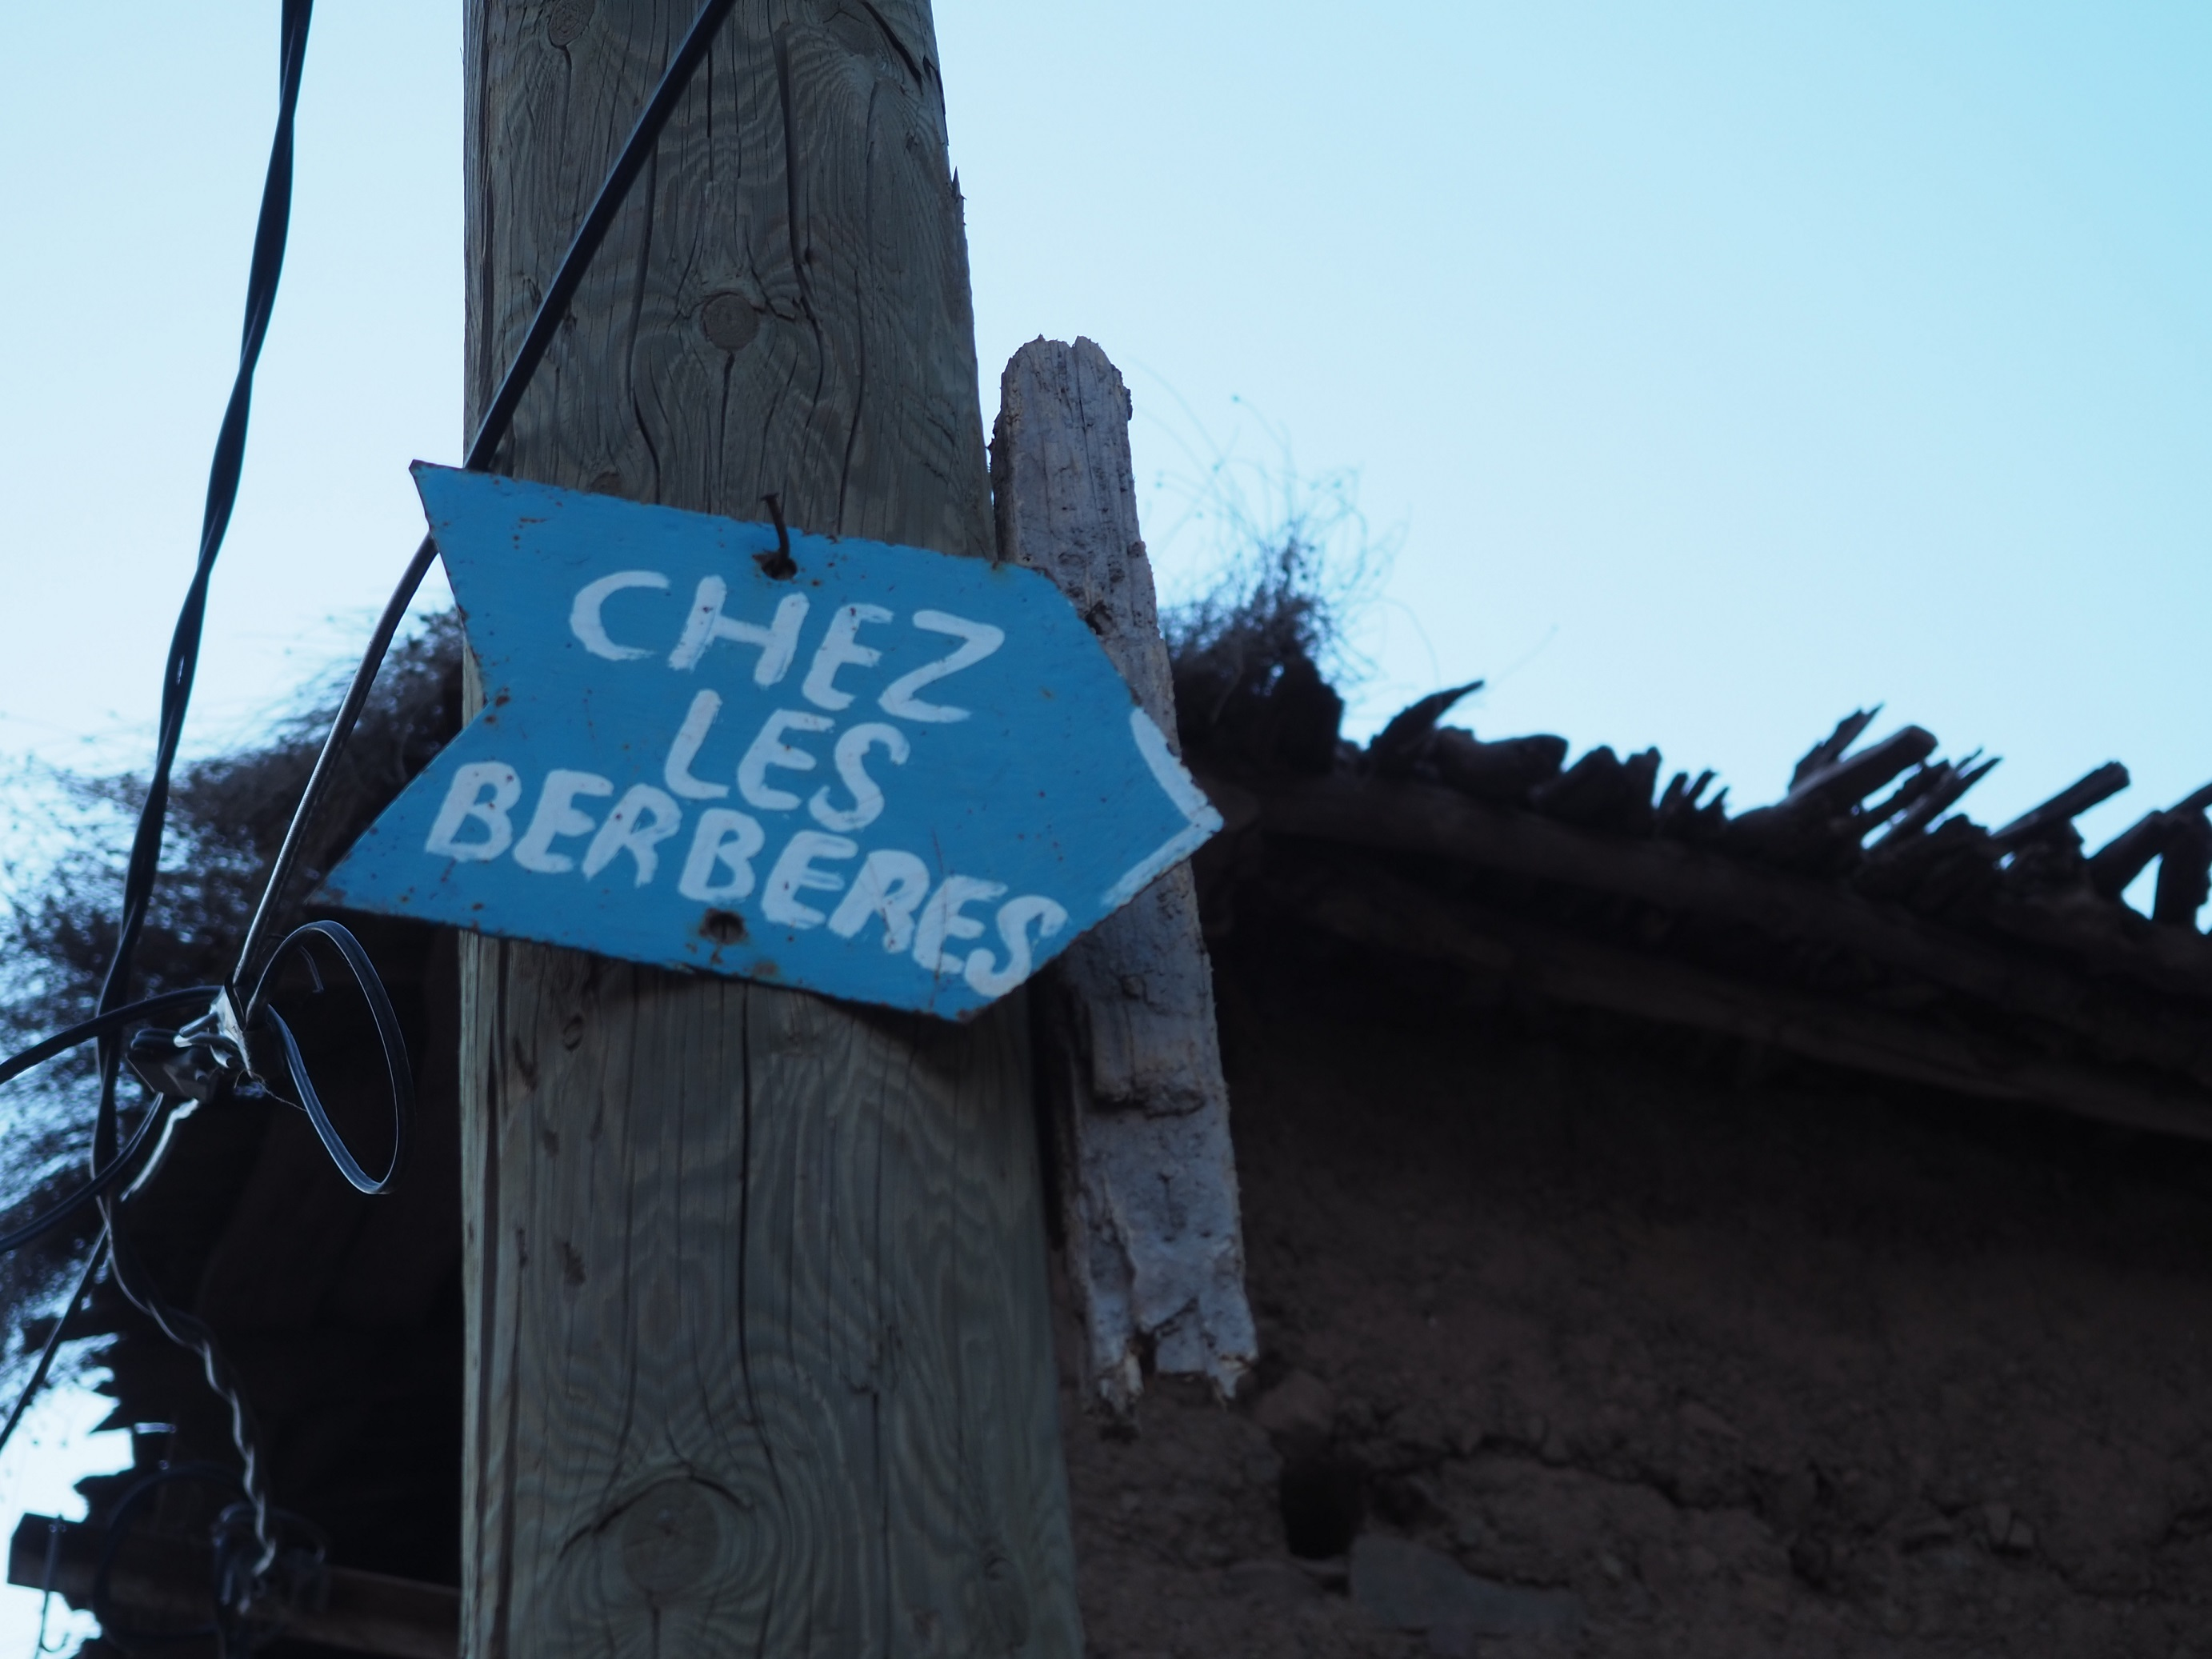 Chez les berberes Tamatert